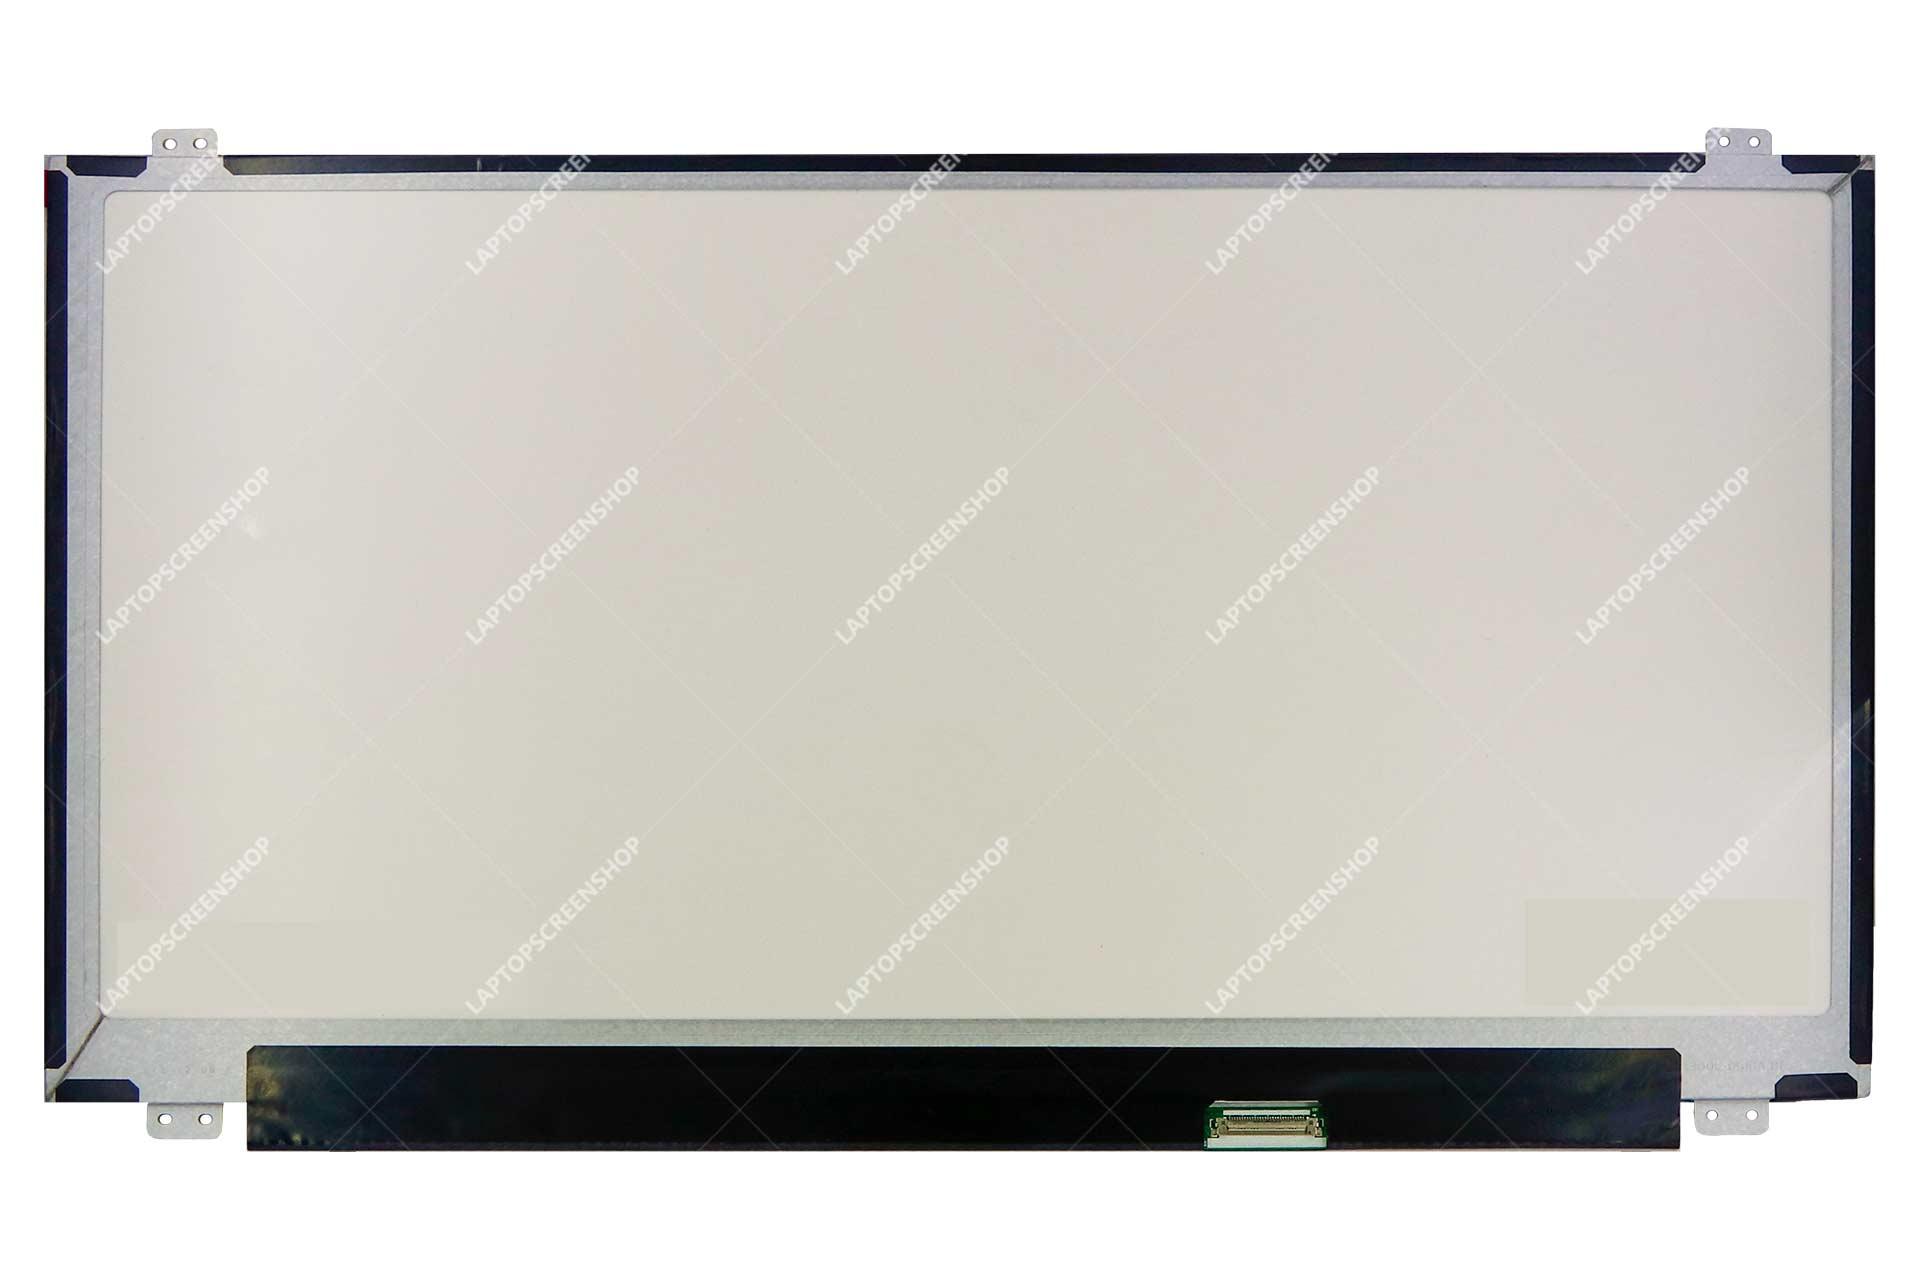 ACER-ASPIRE-E1-510-2871-LCD |HD|فروشگاه لپ تاپ اسکرين | تعمير لپ تاپ